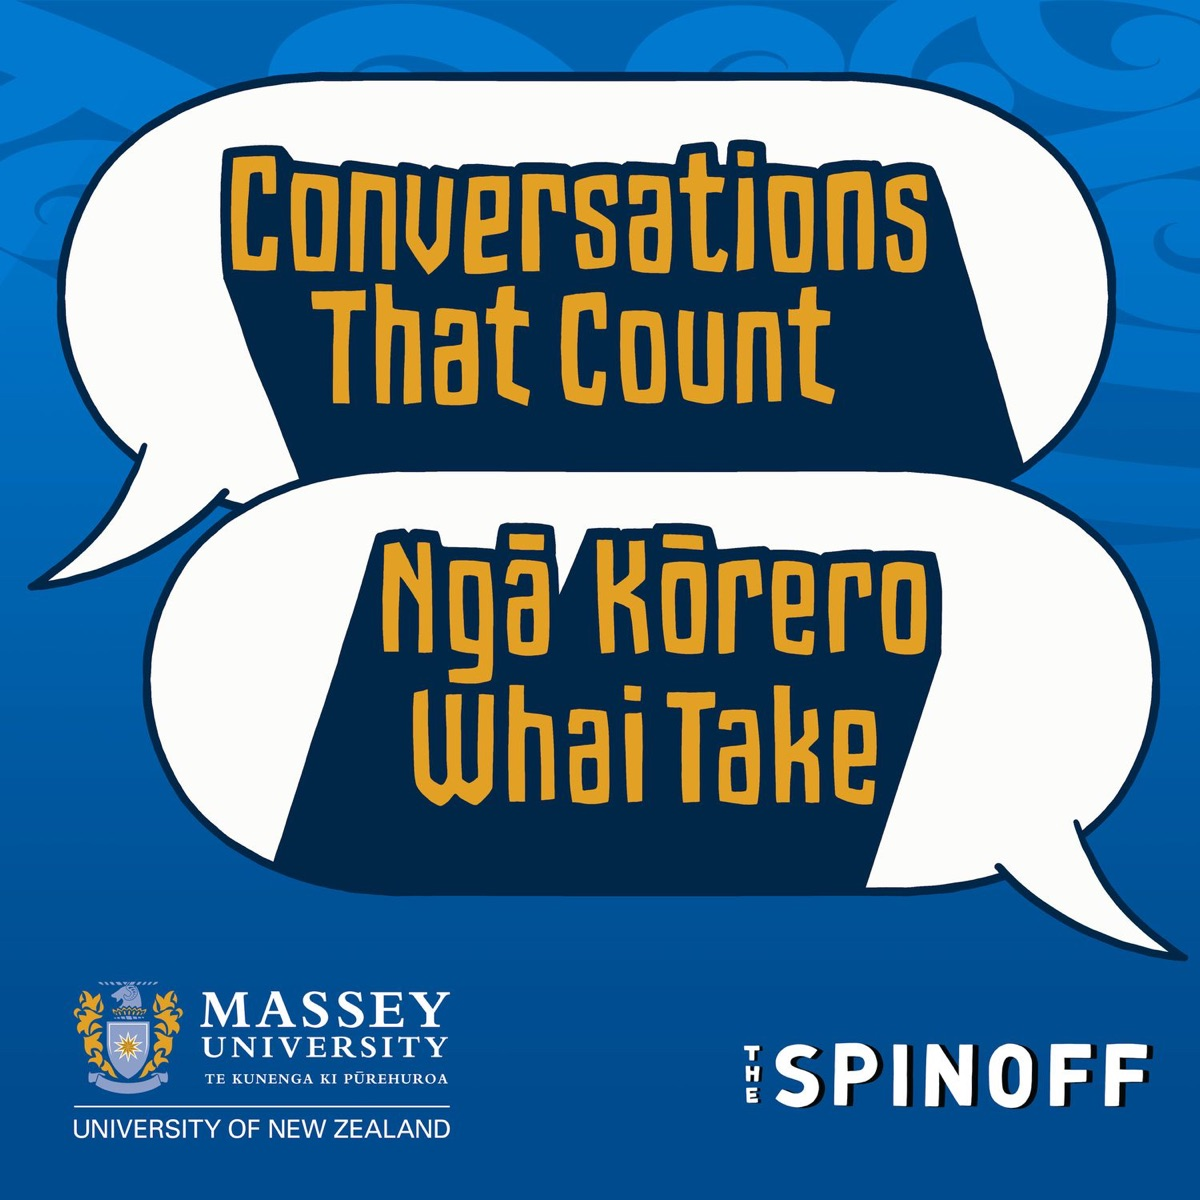 Conversations that Count – Ngā Kōrero Whai Take